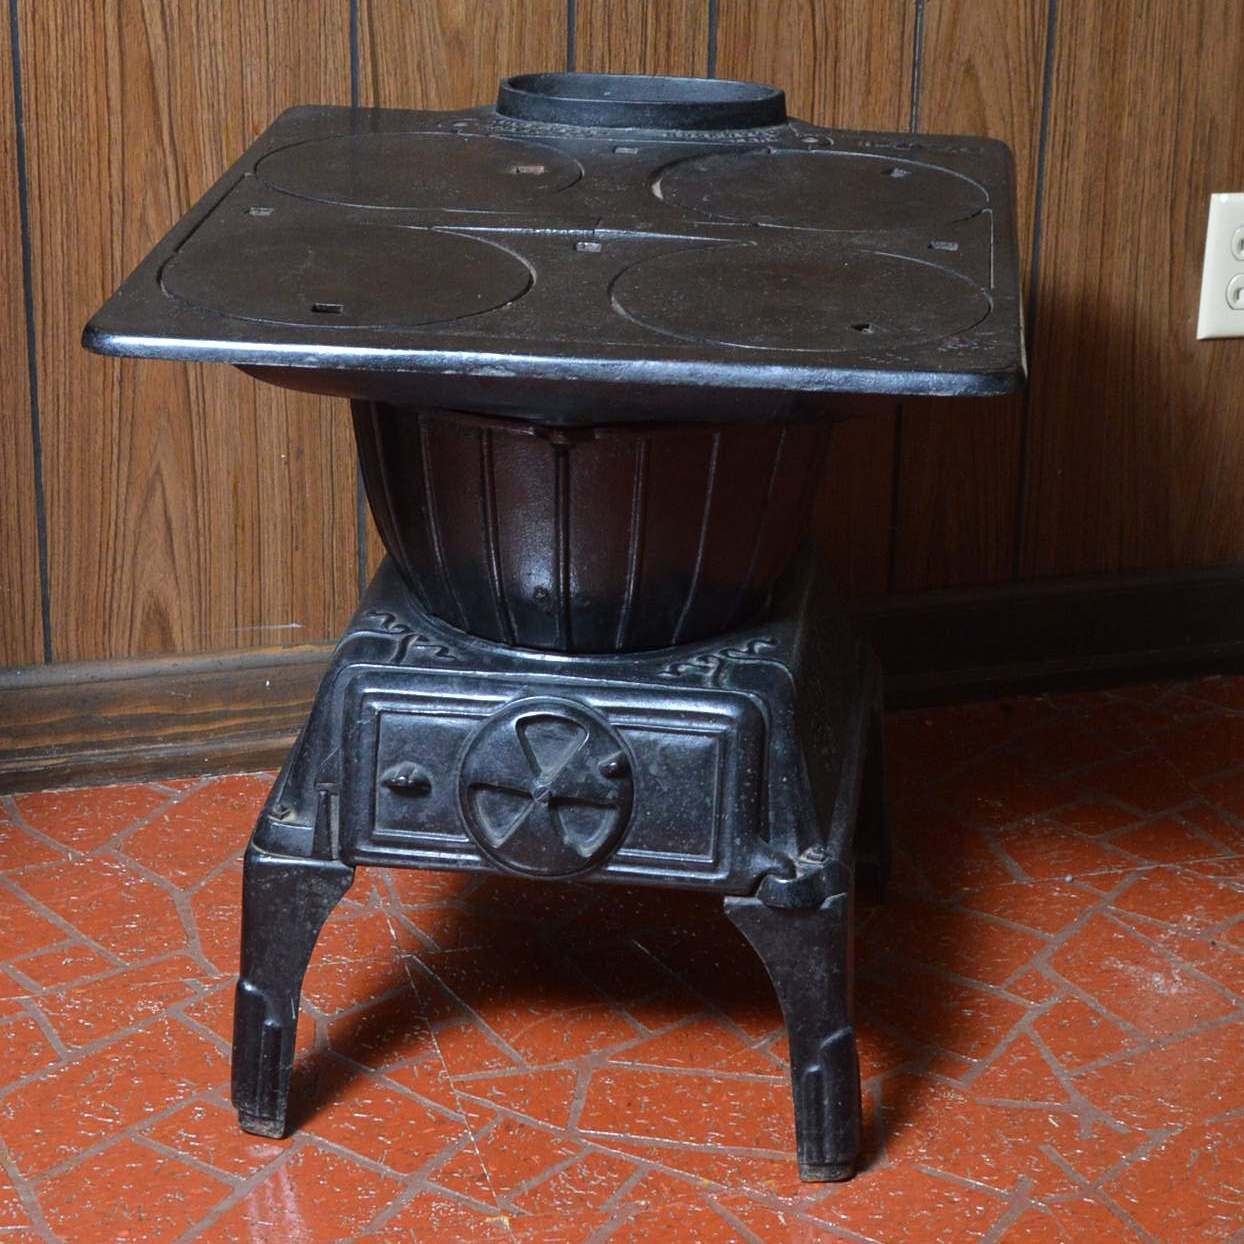 Rockwood Black Cast Iron Stove and Range Top